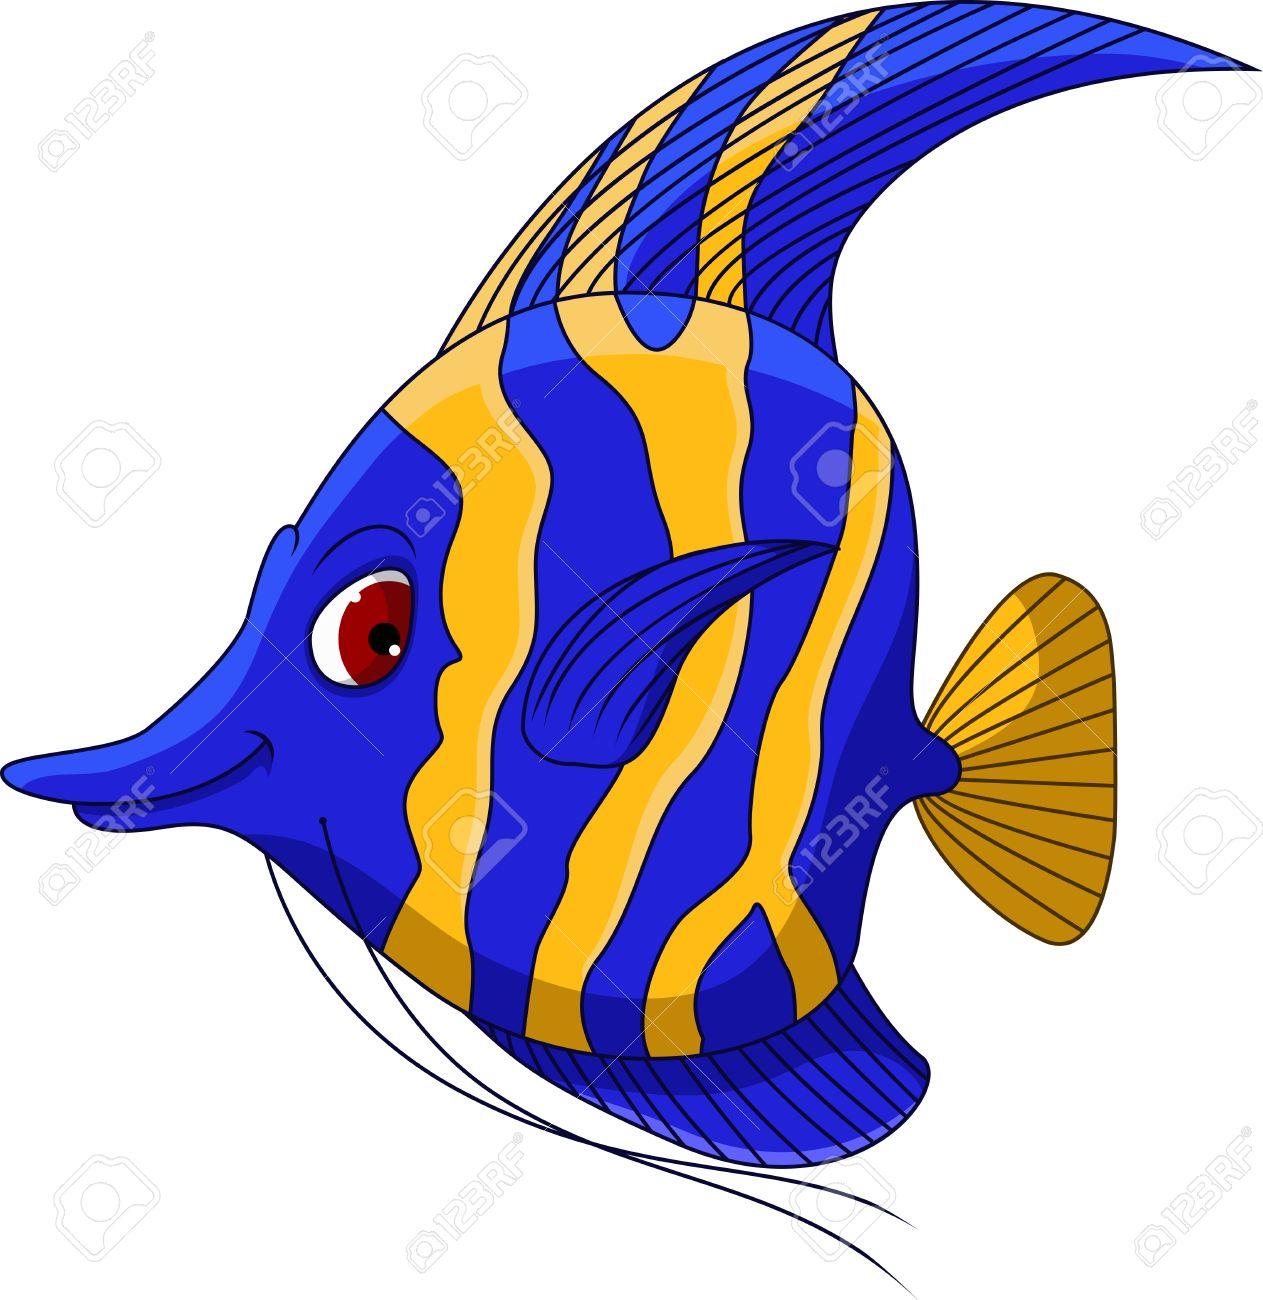 Uncategorized Cartoon Angel Fish angel fish cartoon for you design royalty free cliparts vectors stock vector 27897119